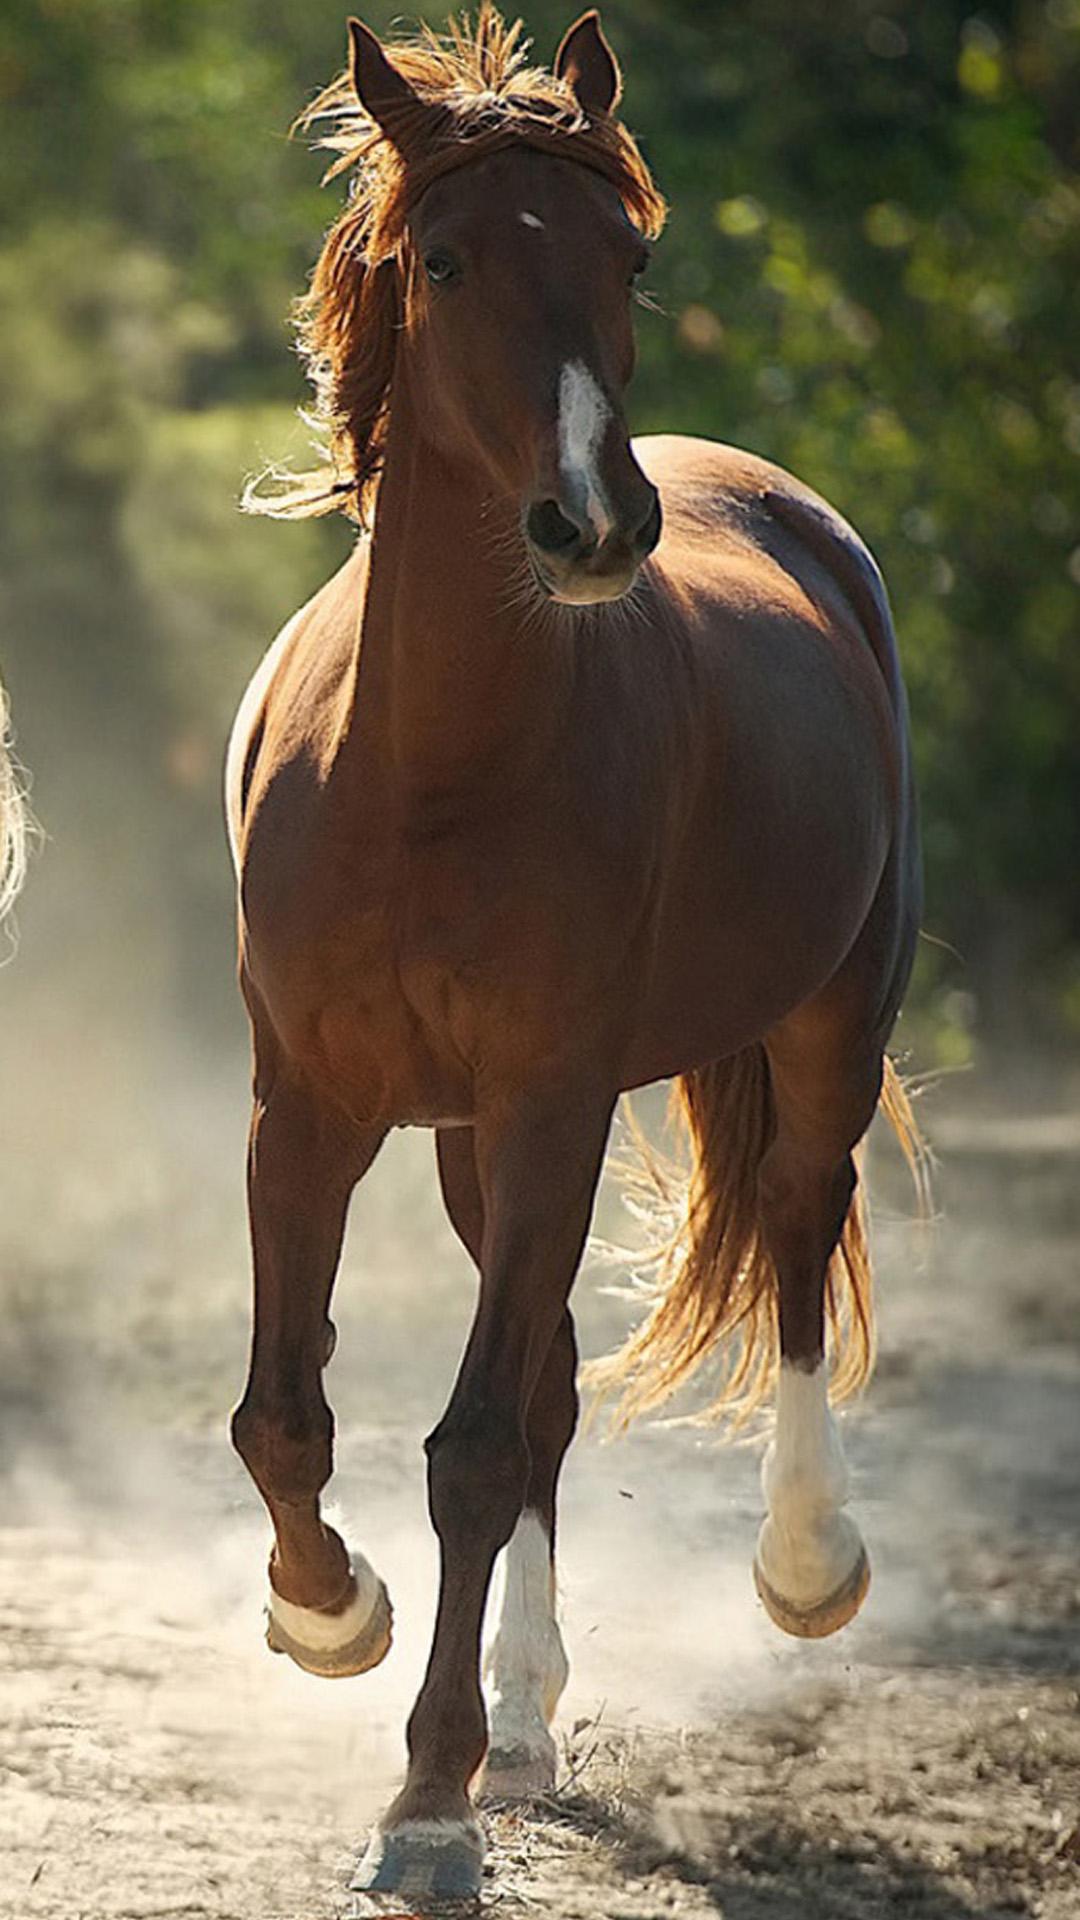 Brown Horse IPhone Wallpaper